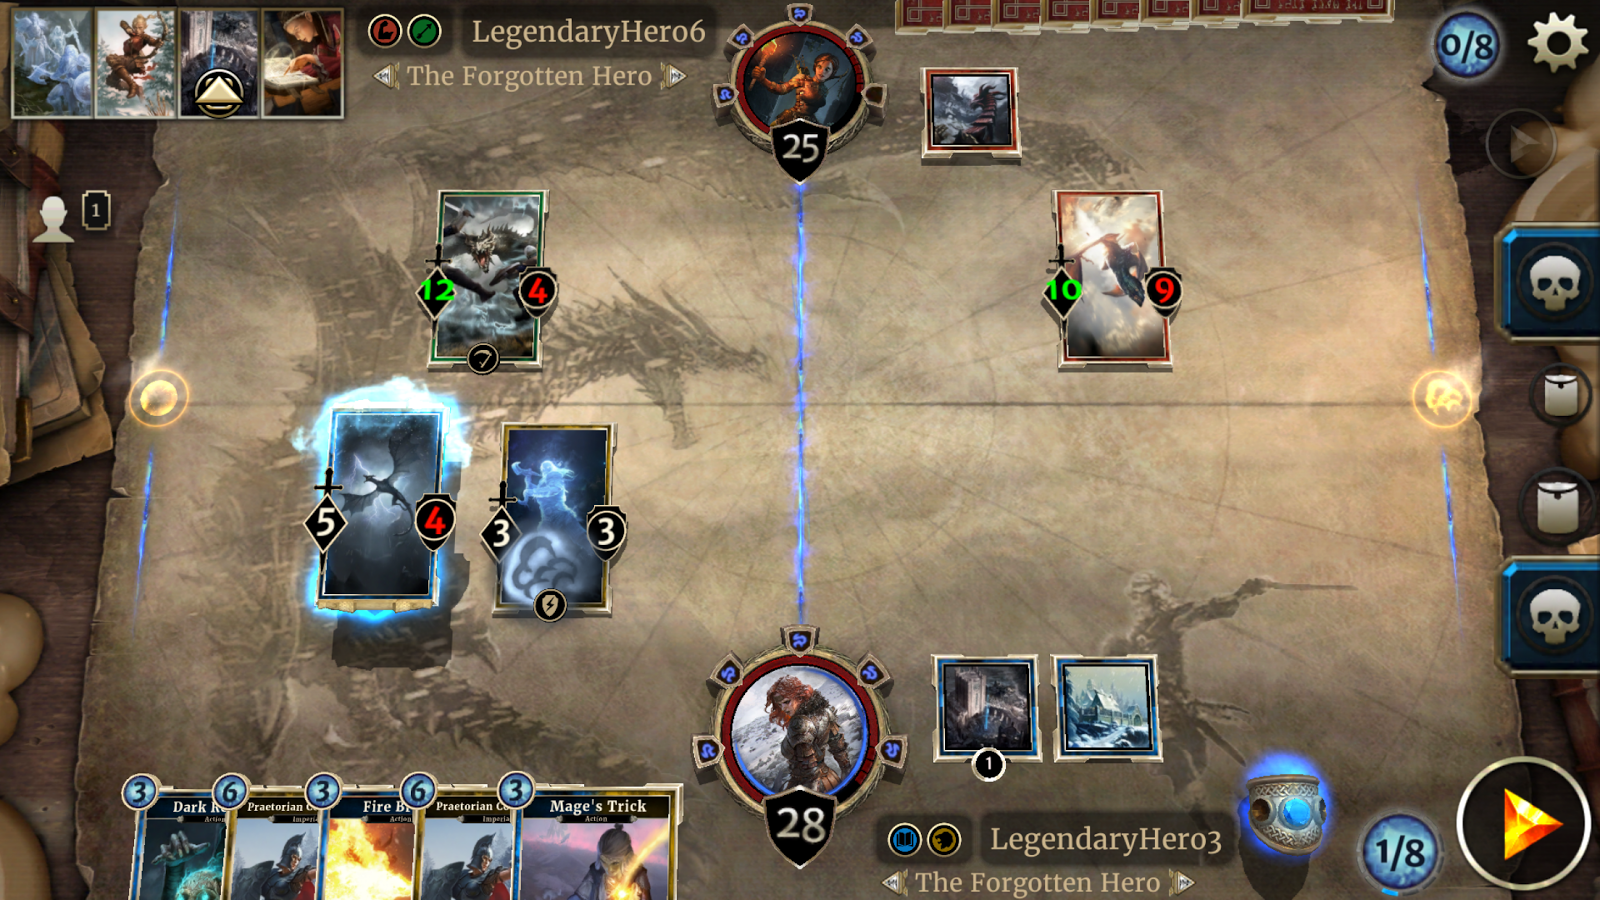 the elder scrolls legends heroes of skyrim 1 67 1 apk download